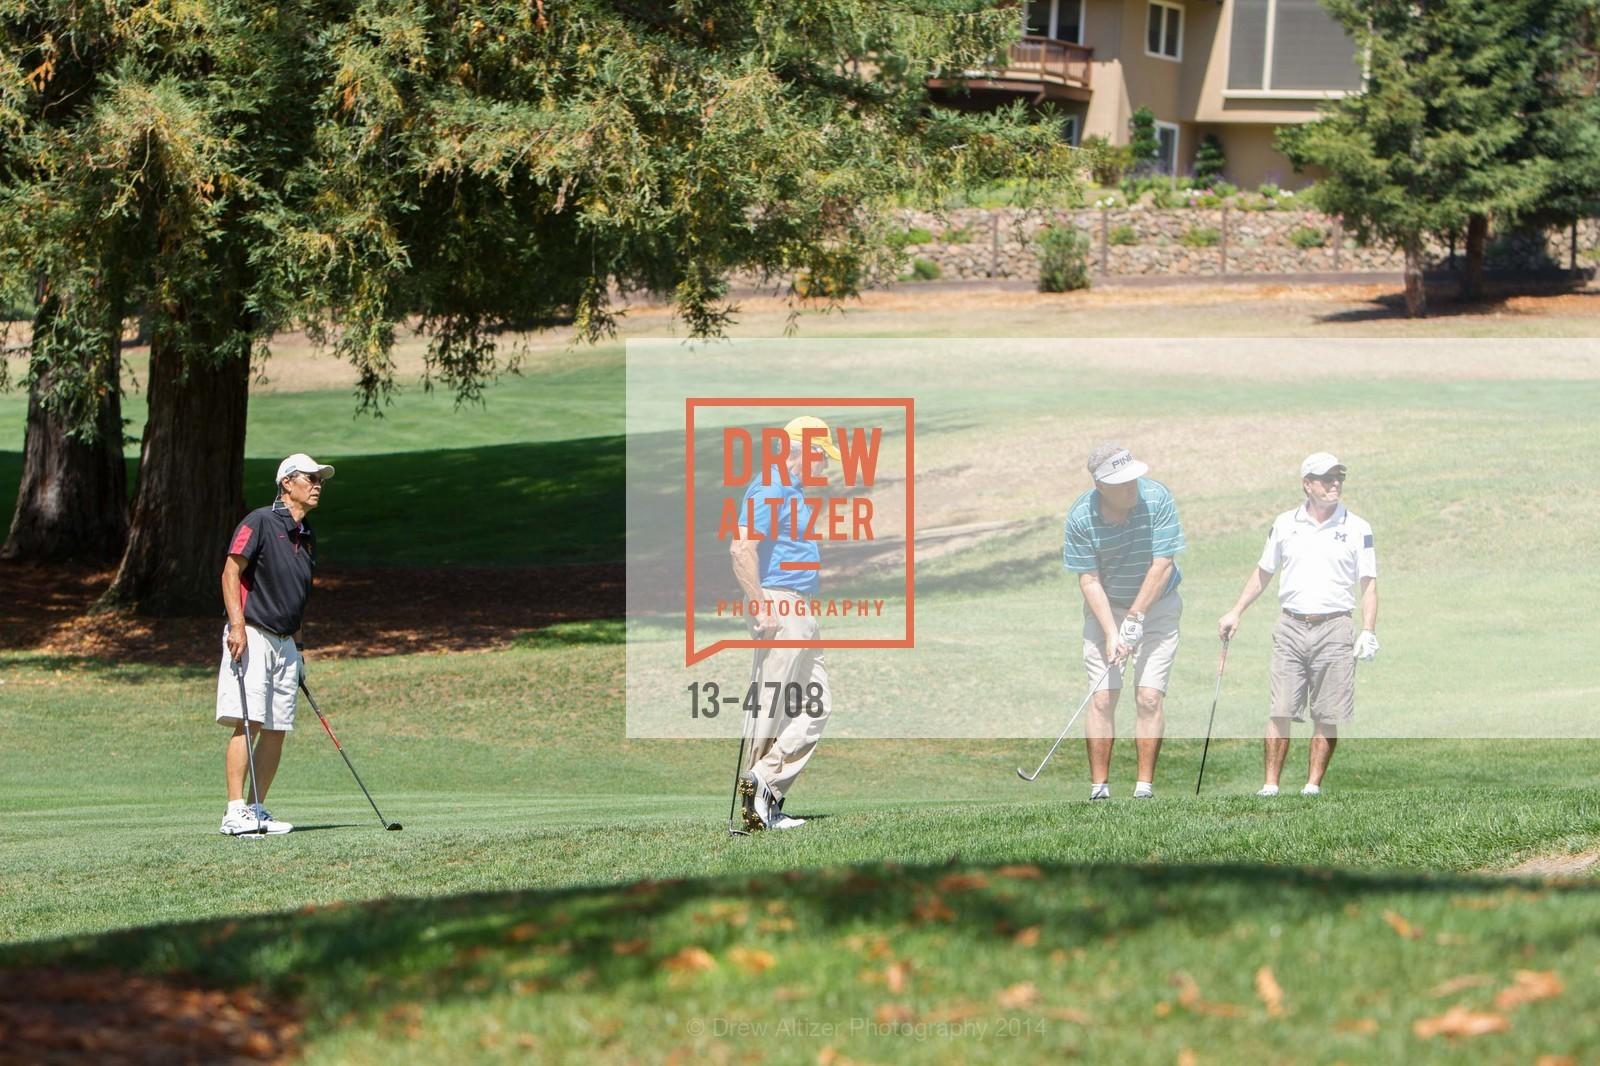 Bob Eng, Bill Marr, Russ Vavuris, Marty Putnam, Photo #13-4708